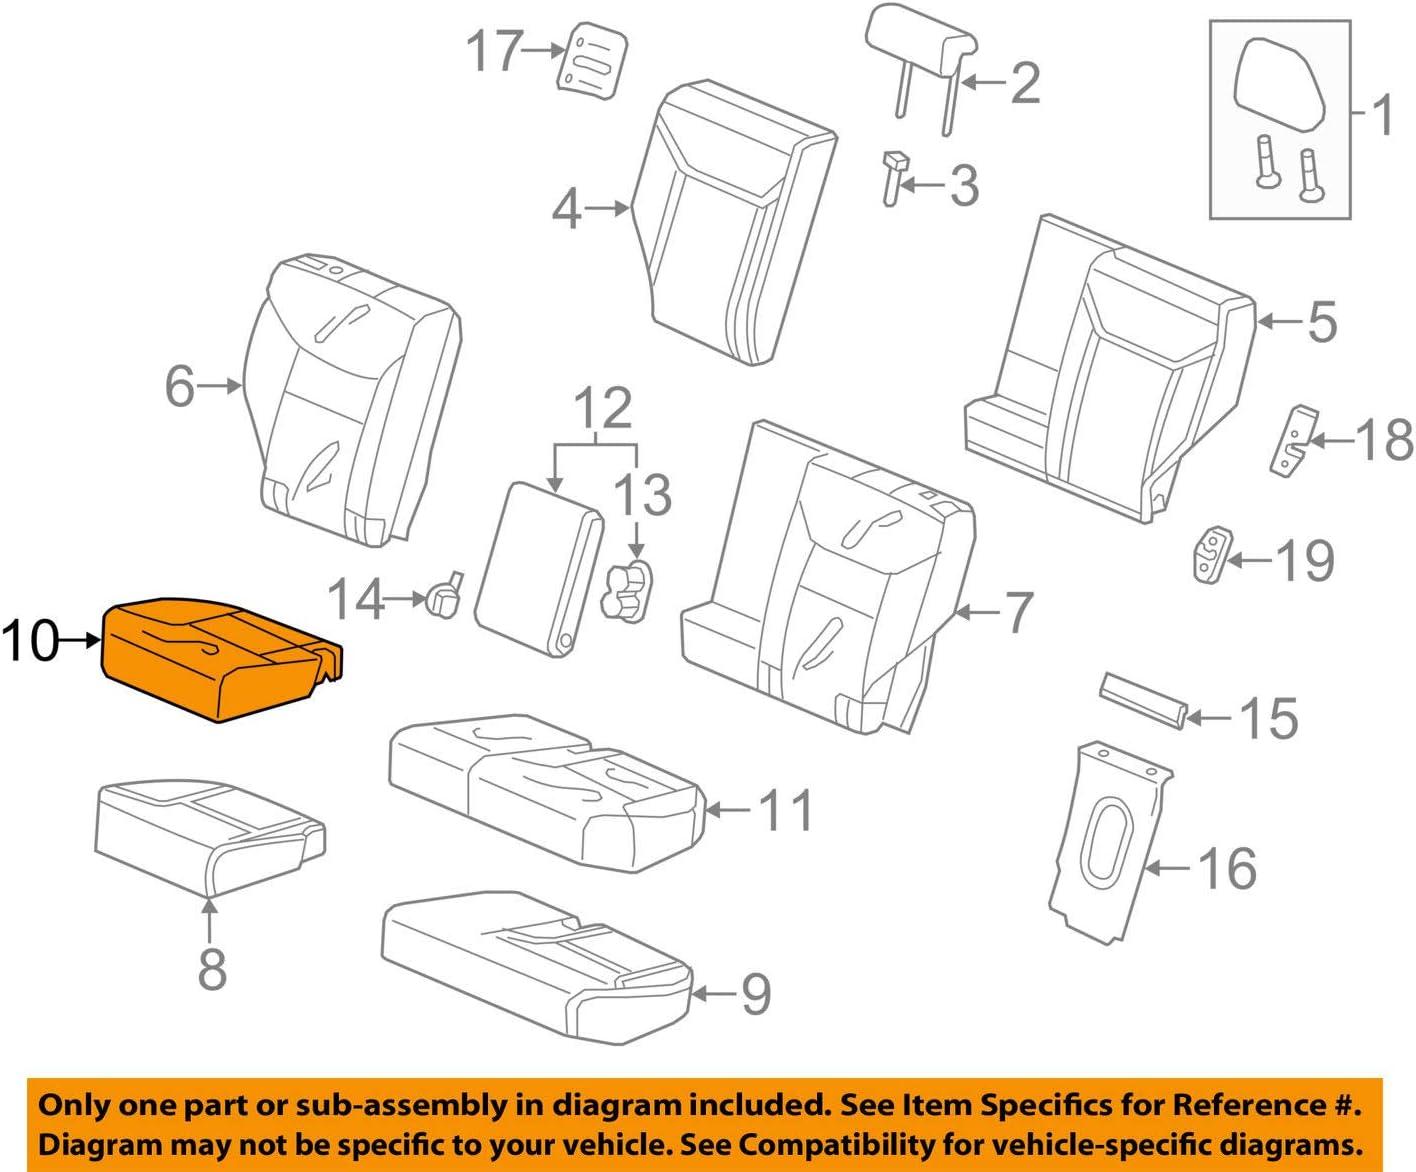 Rear Honda Genuine 82131-T0G-A41ZC Seat Cushion Trim Cover Right